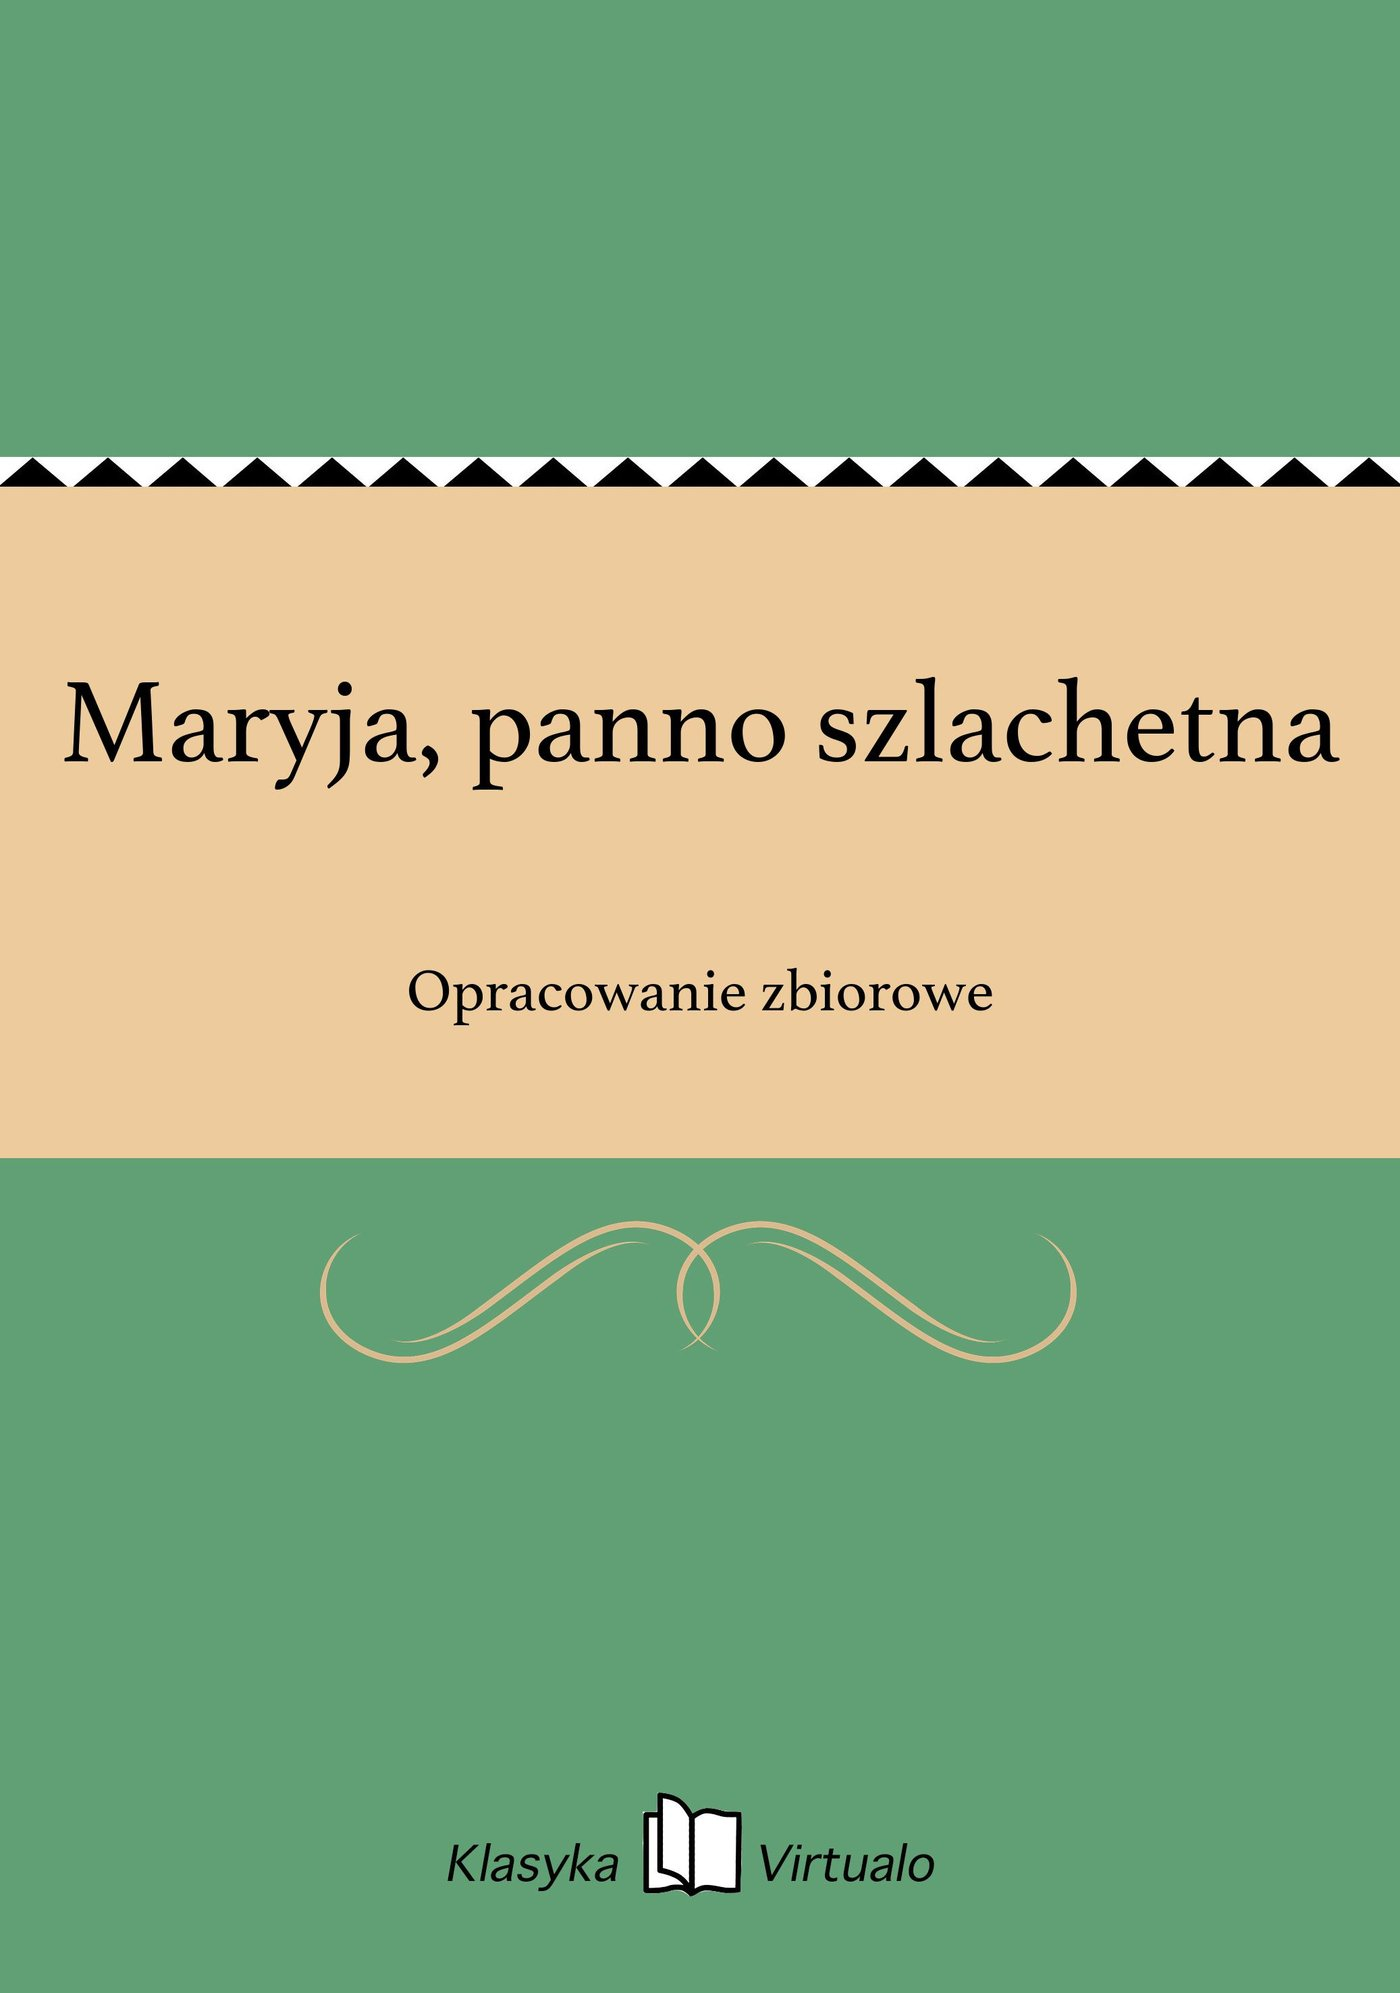 Maryja, panno szlachetna - Ebook (Książka EPUB) do pobrania w formacie EPUB